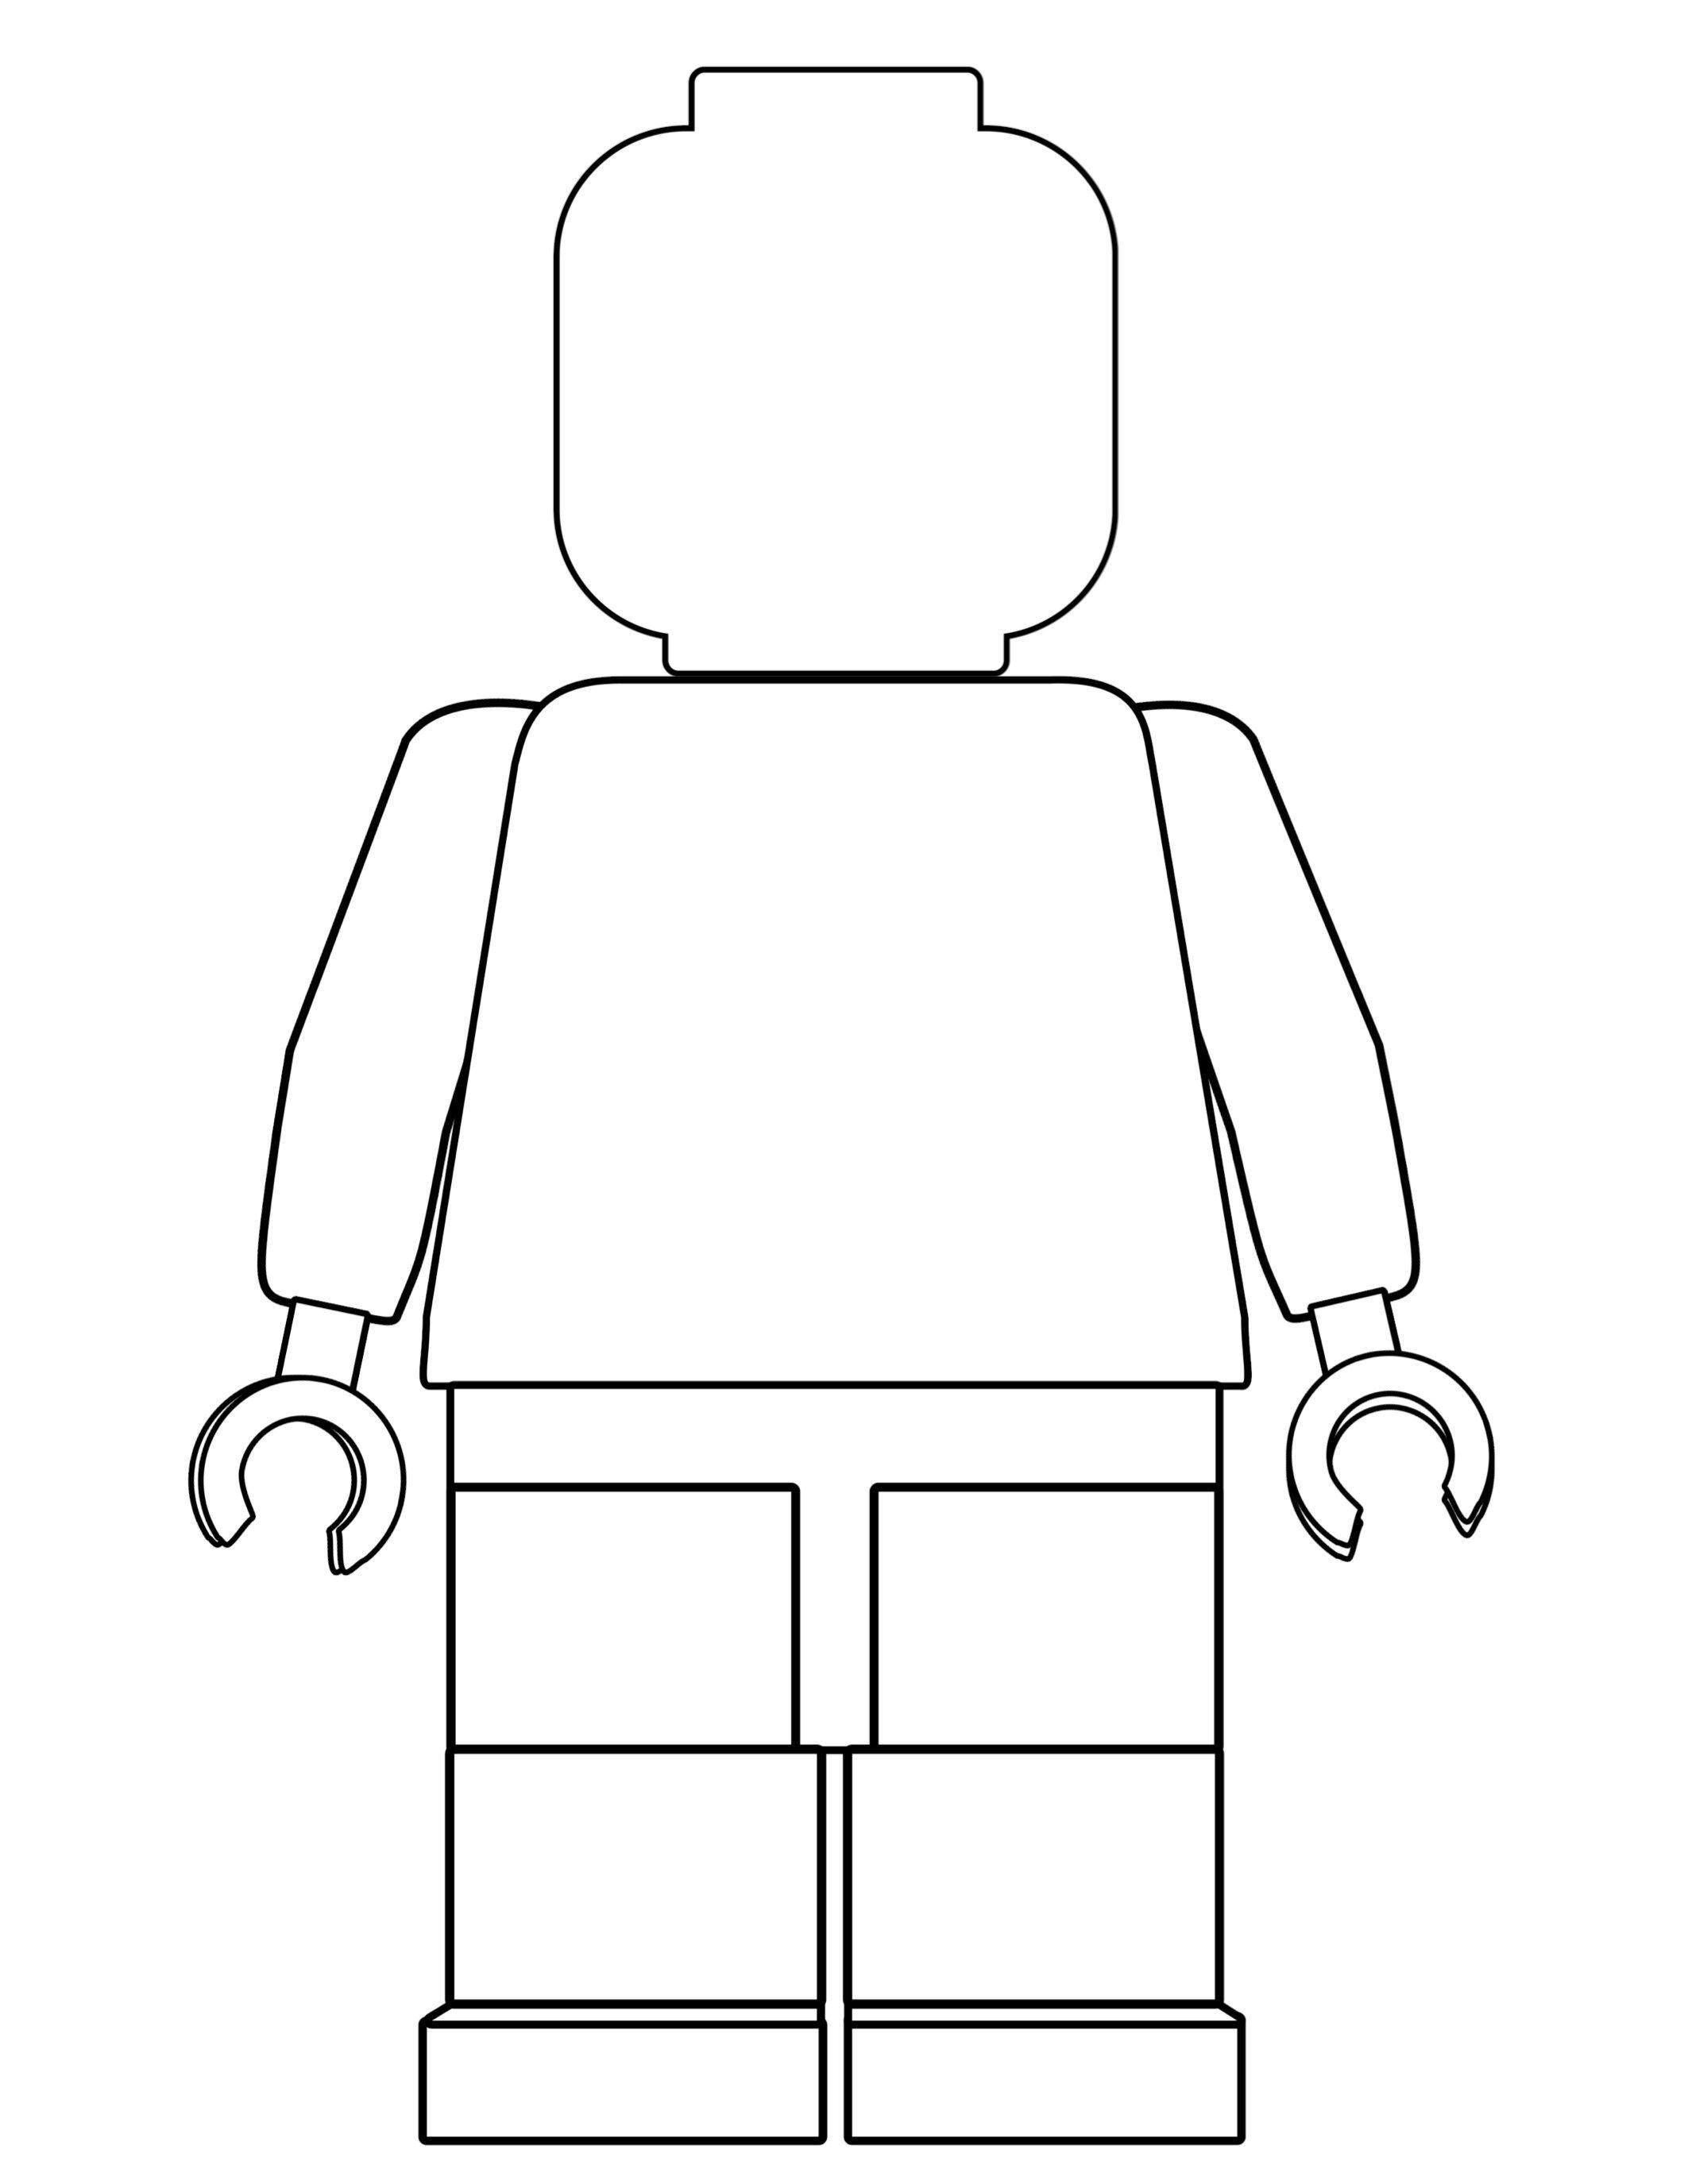 Pin By Ilona Wrobel On Ninjago Lego Coloring Pages Free Lego Lego Birthday